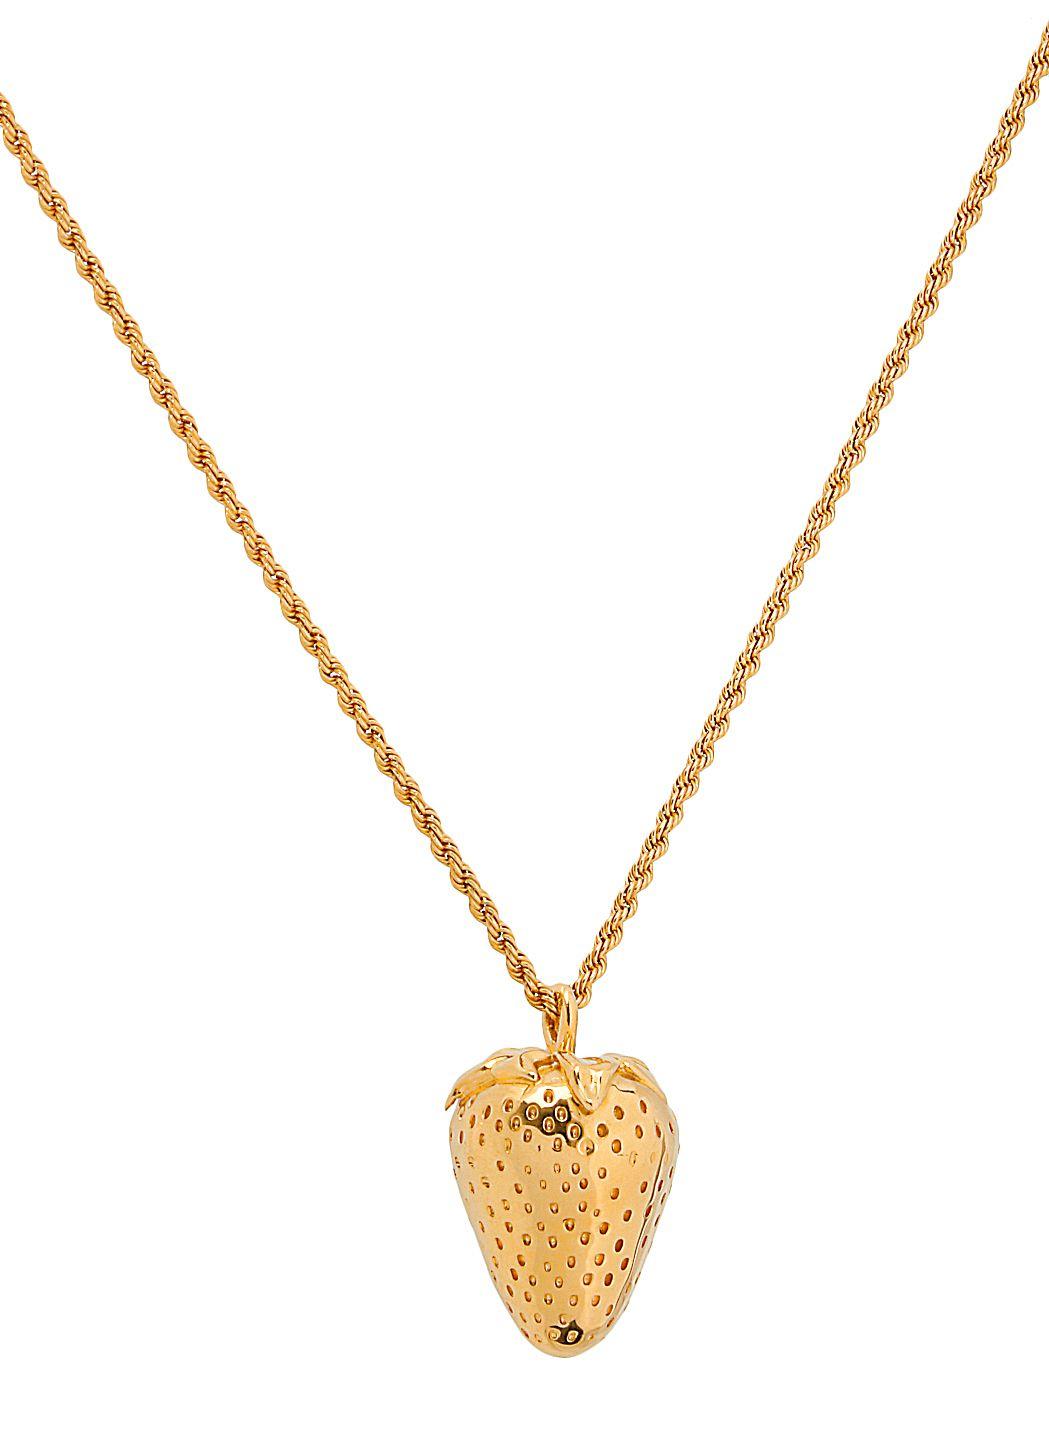 Strawberry charm necklace